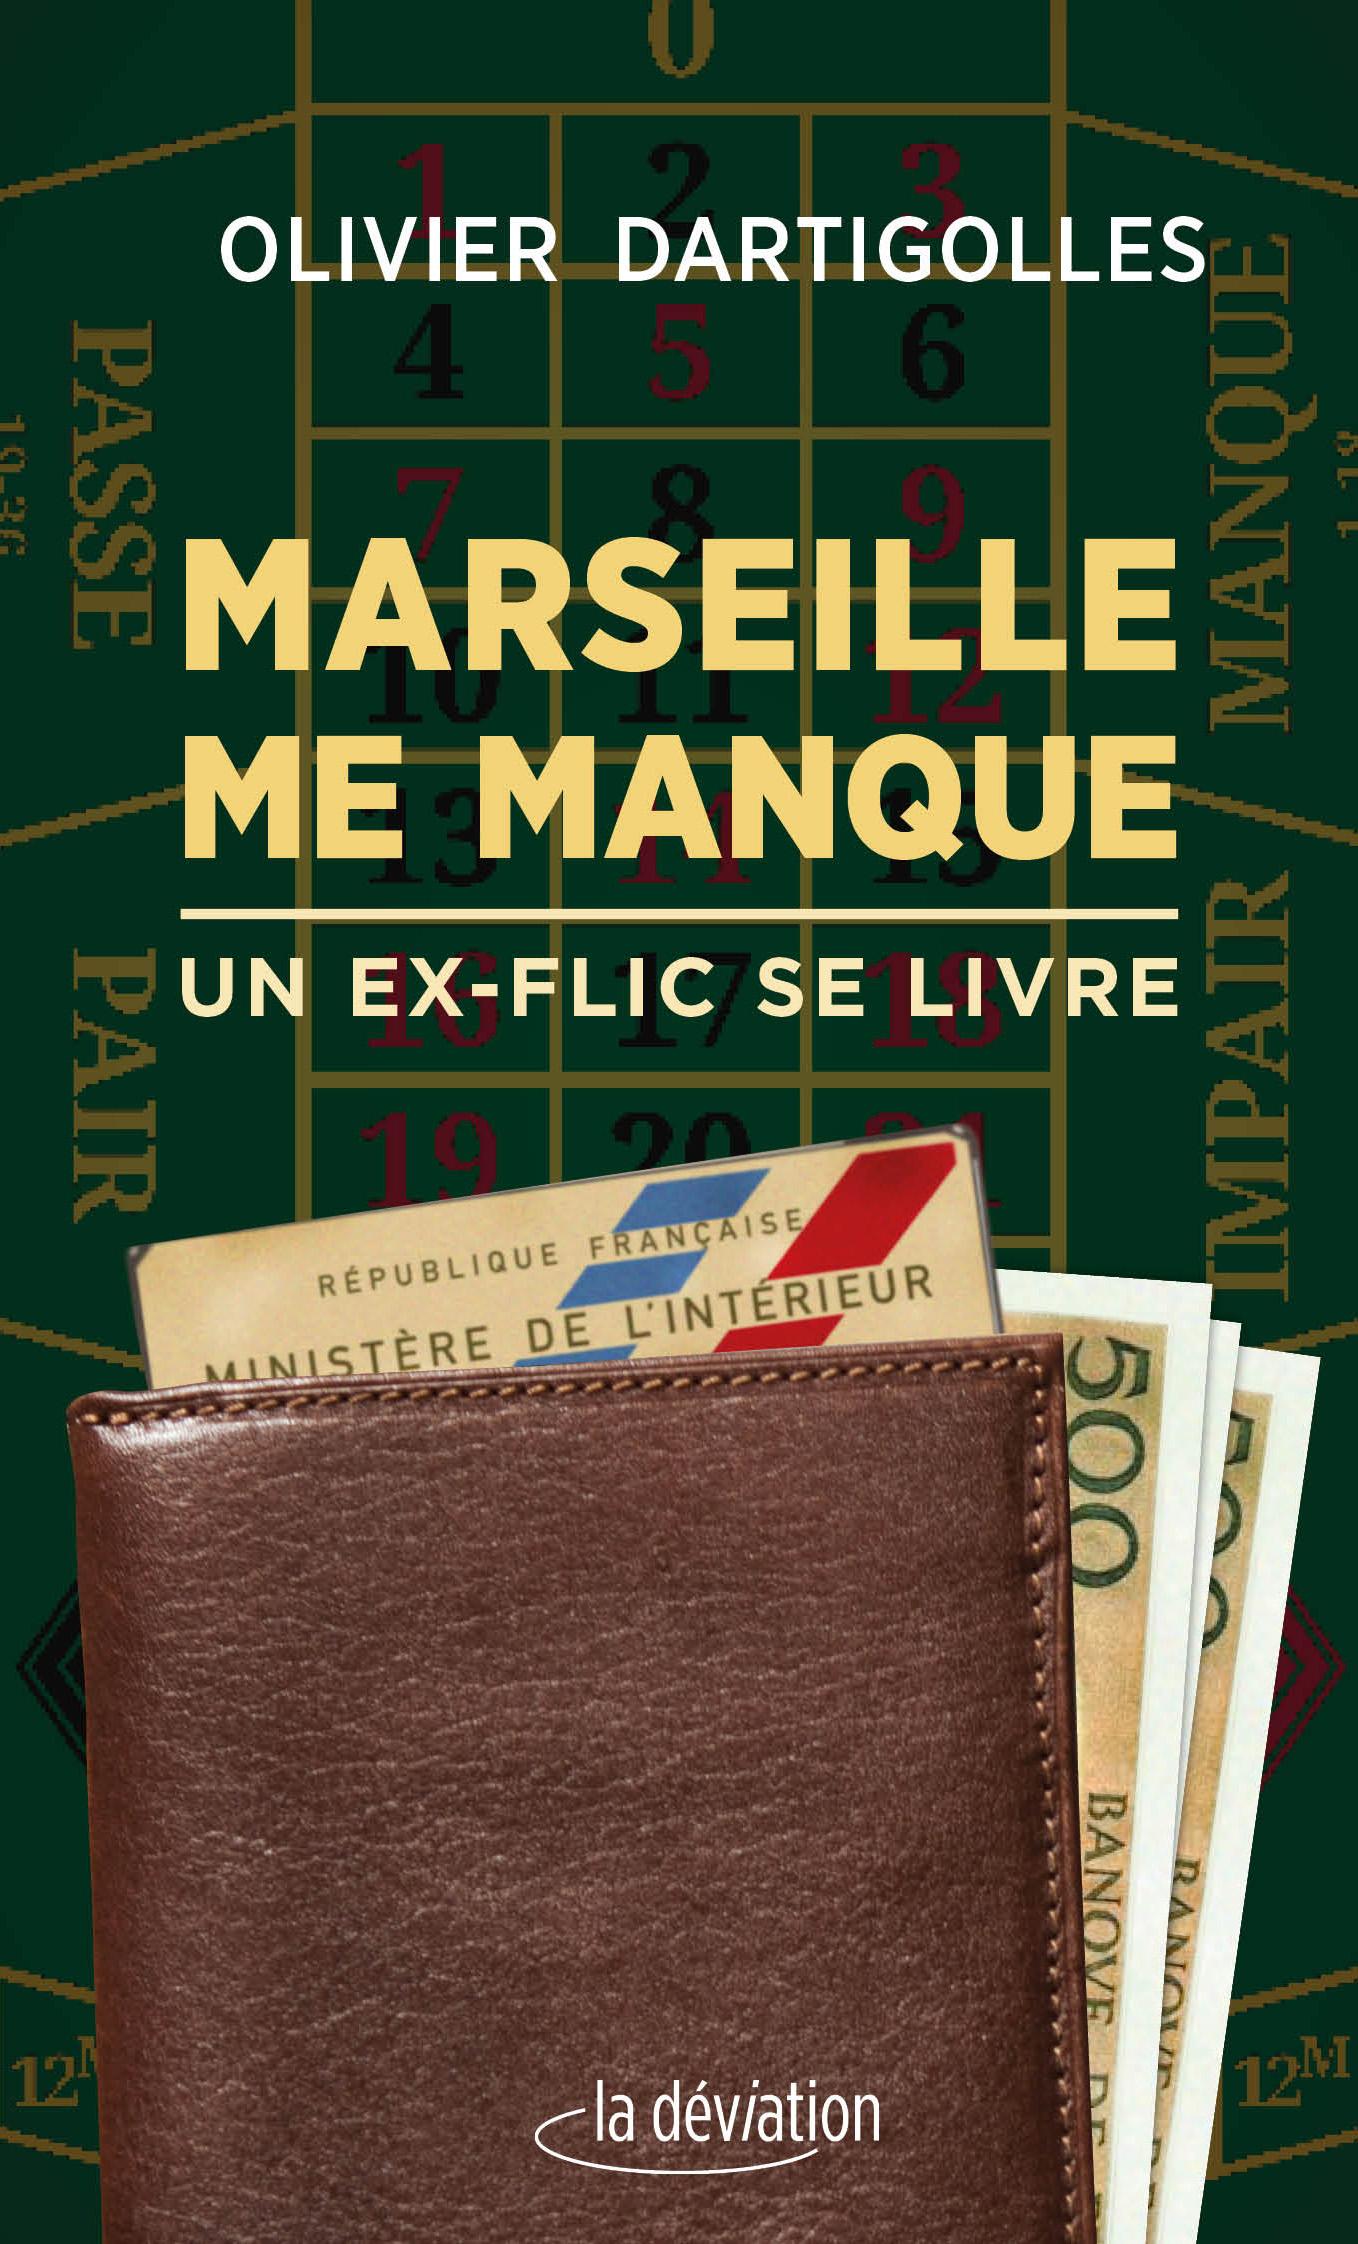 Marseille me manque